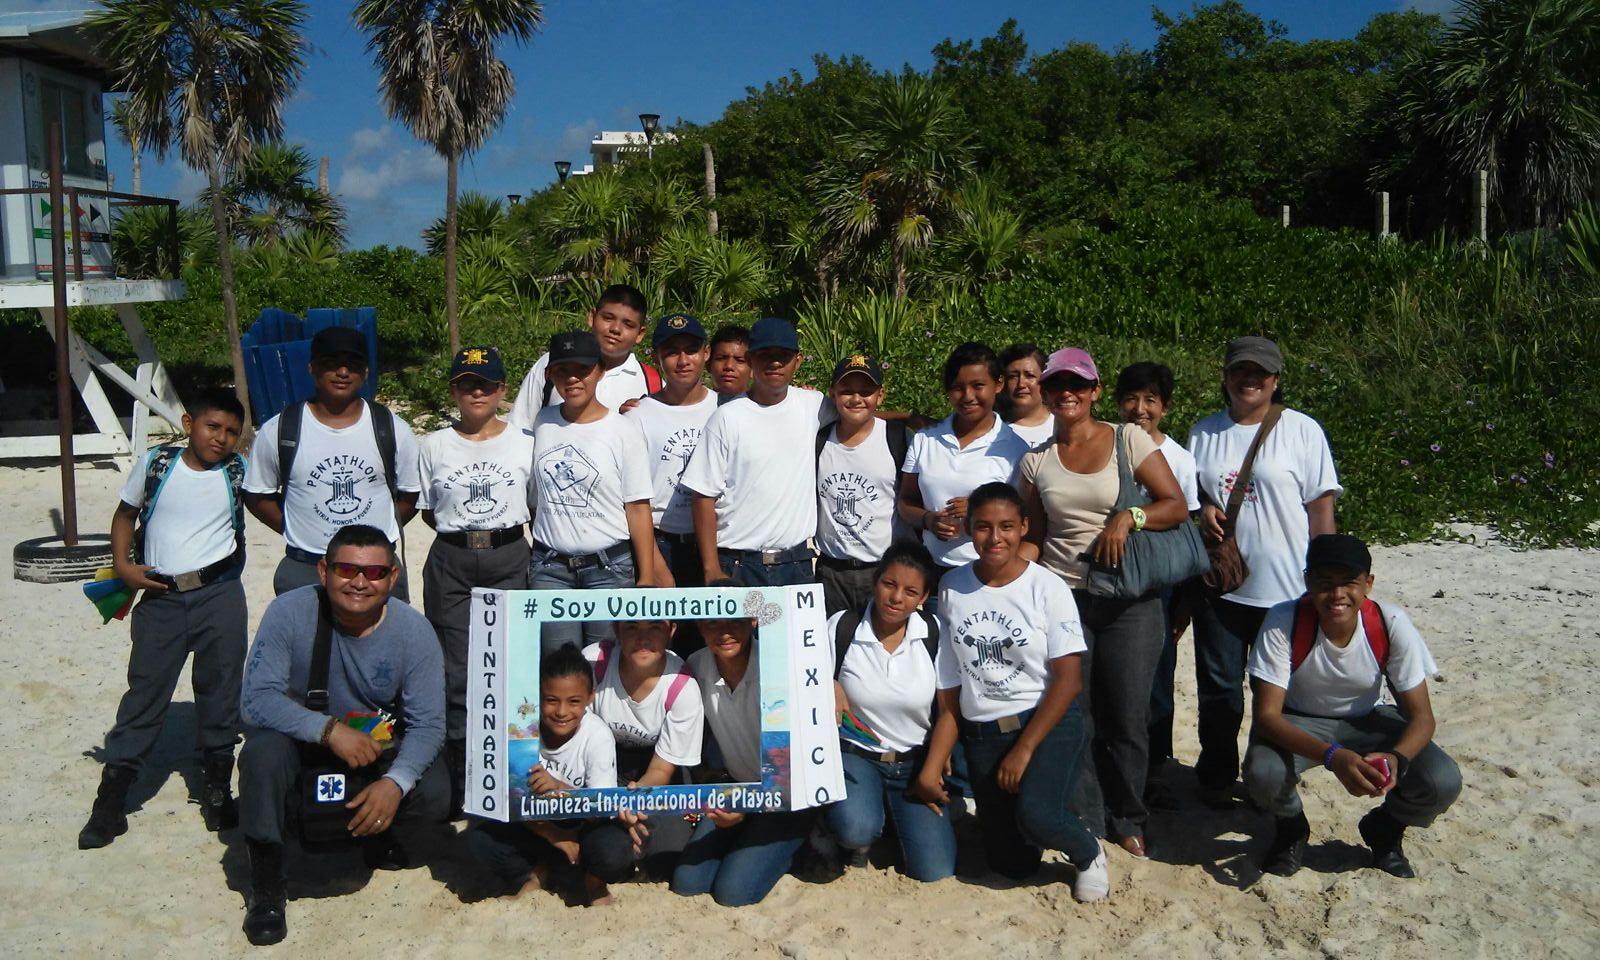 Mexico - Playa del Carmen - ICC2015 - 8.jpg